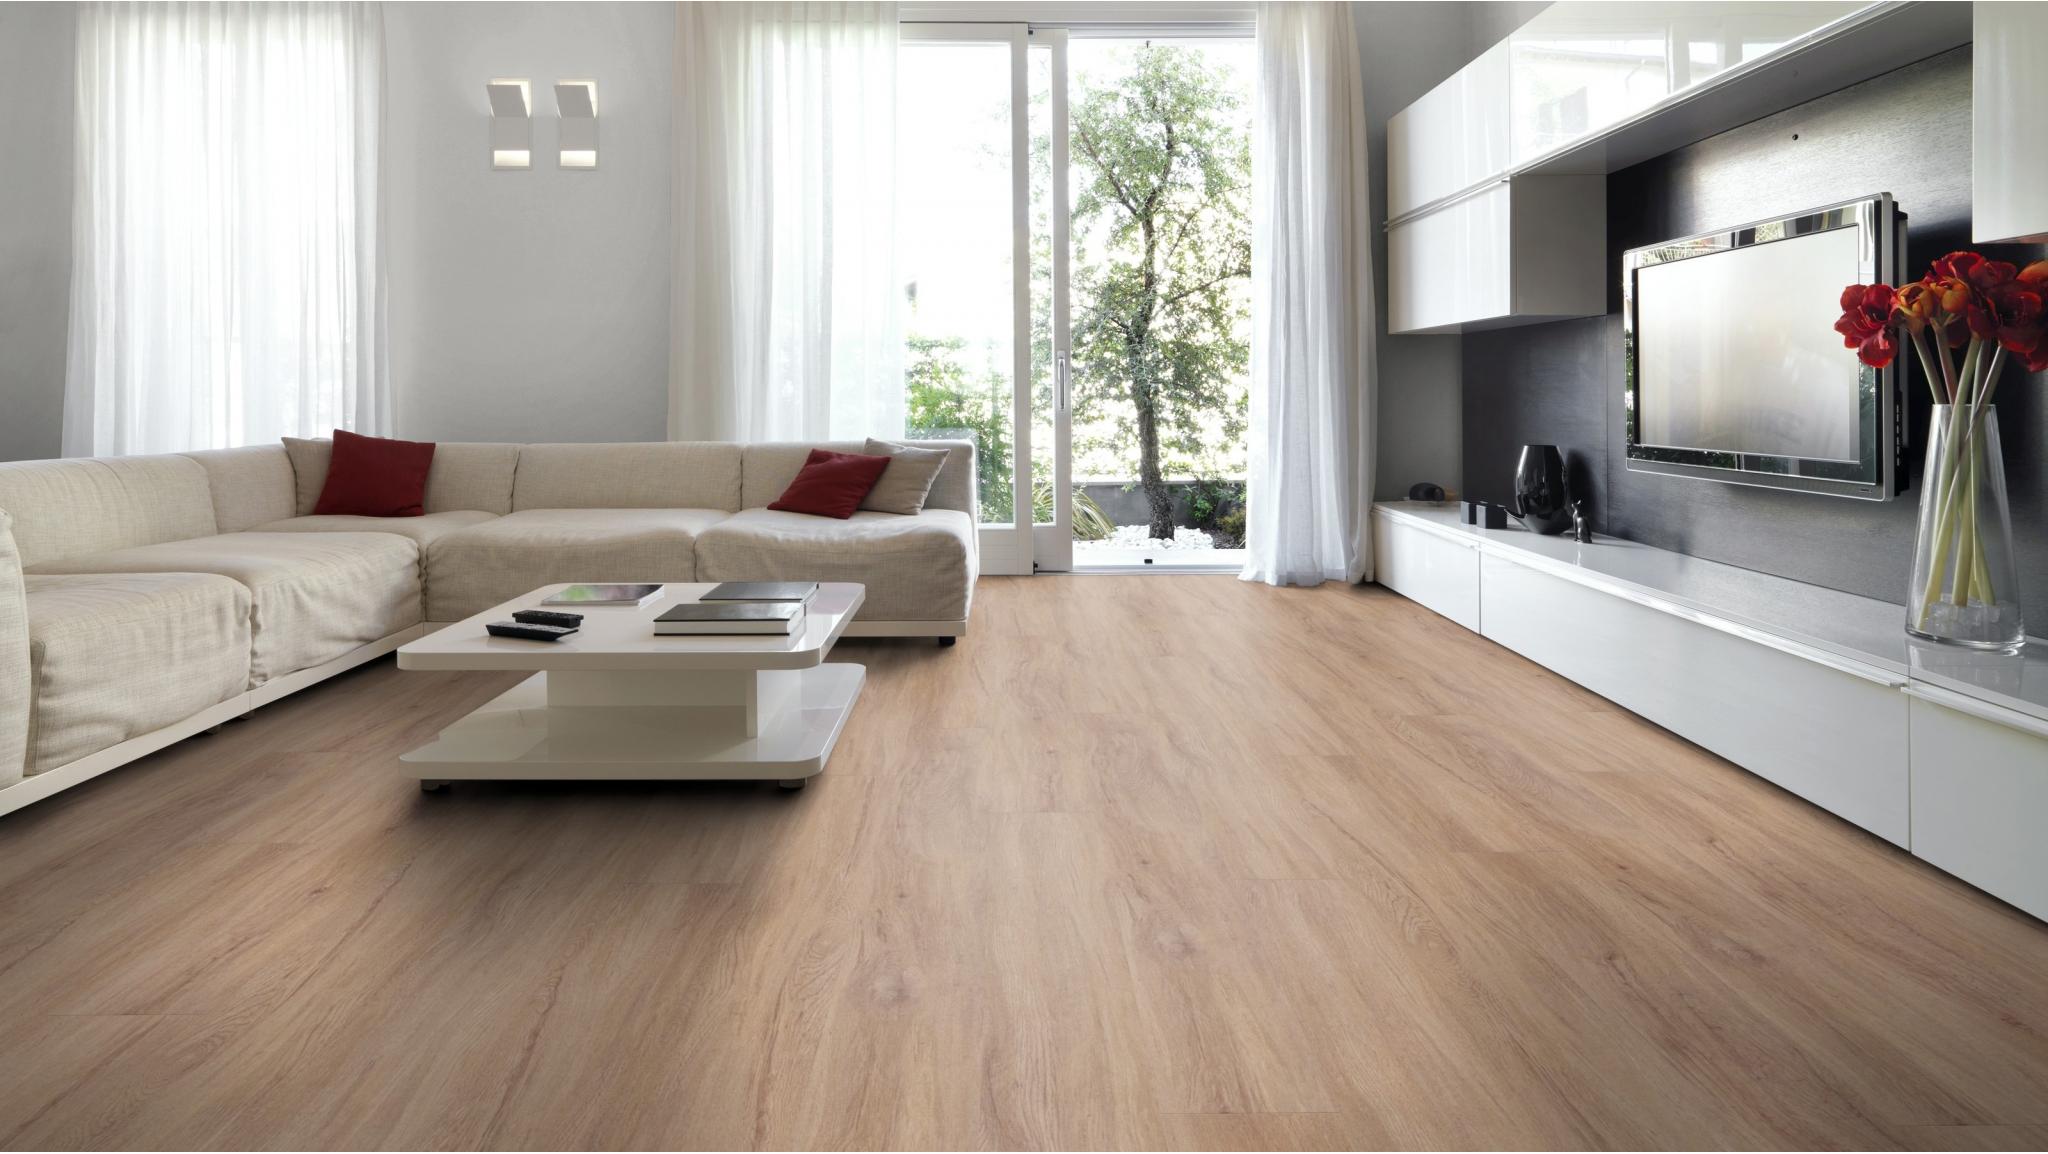 Dikte Pvc Vloer : Warm winter donker bruin visgraat pvc vloer in houtlook handyfloor